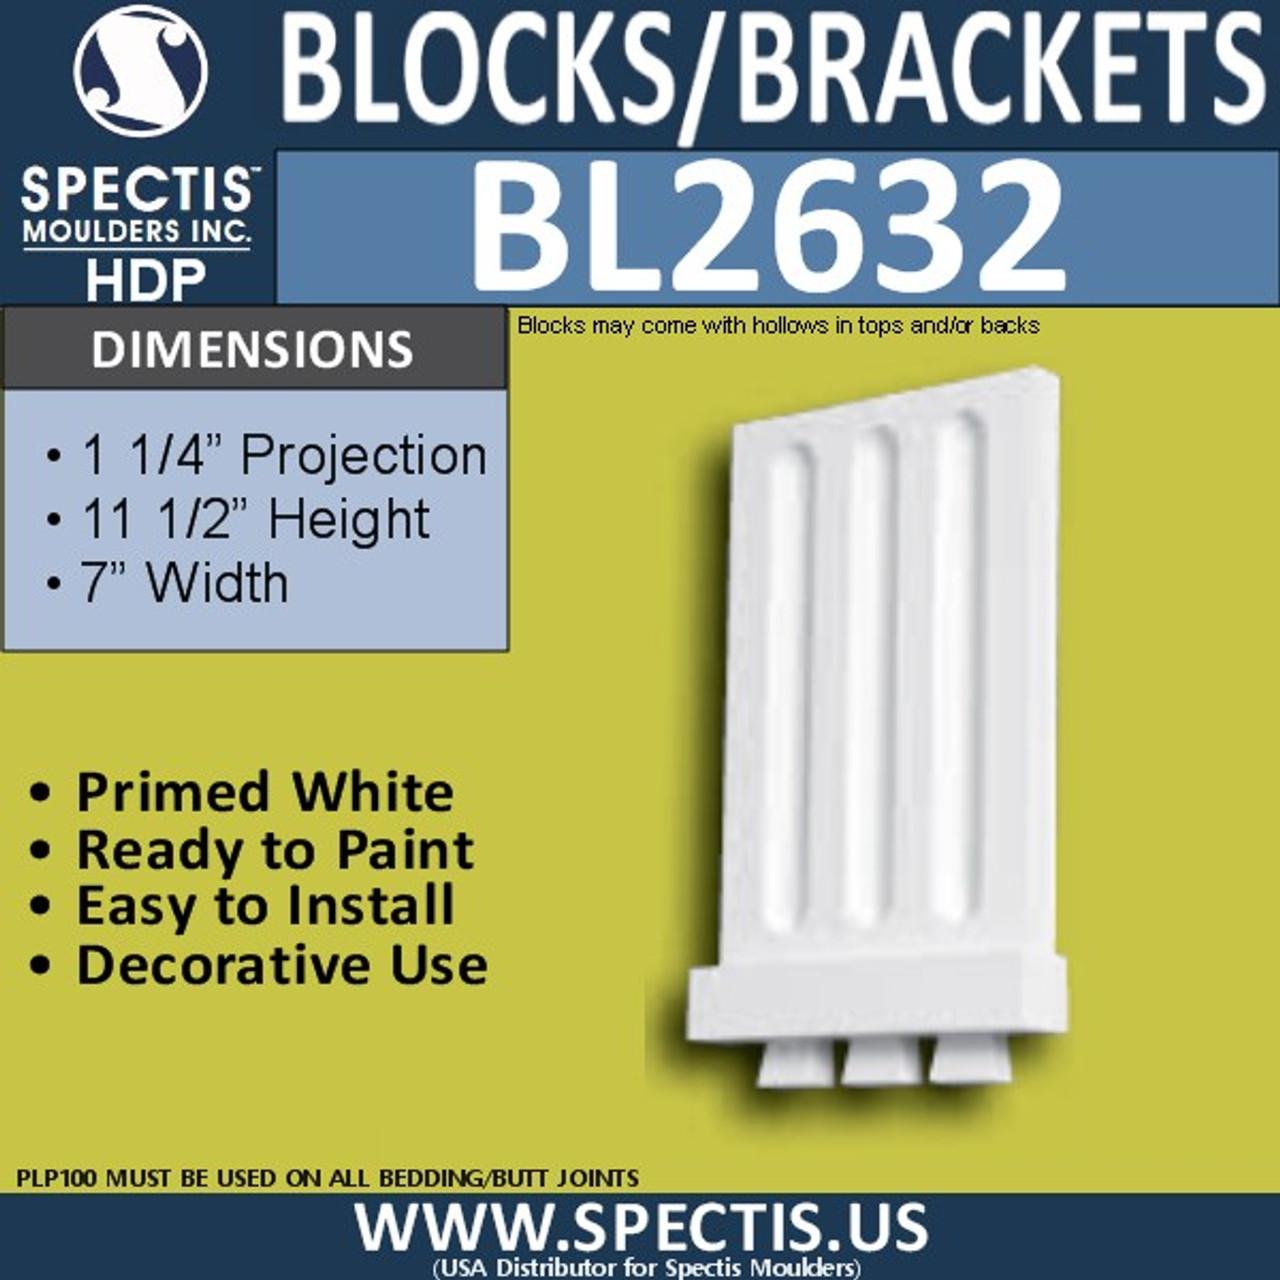 "BL2632 Eave Block or Bracket 6.5""W x 11.5""H x 0.75"" P"